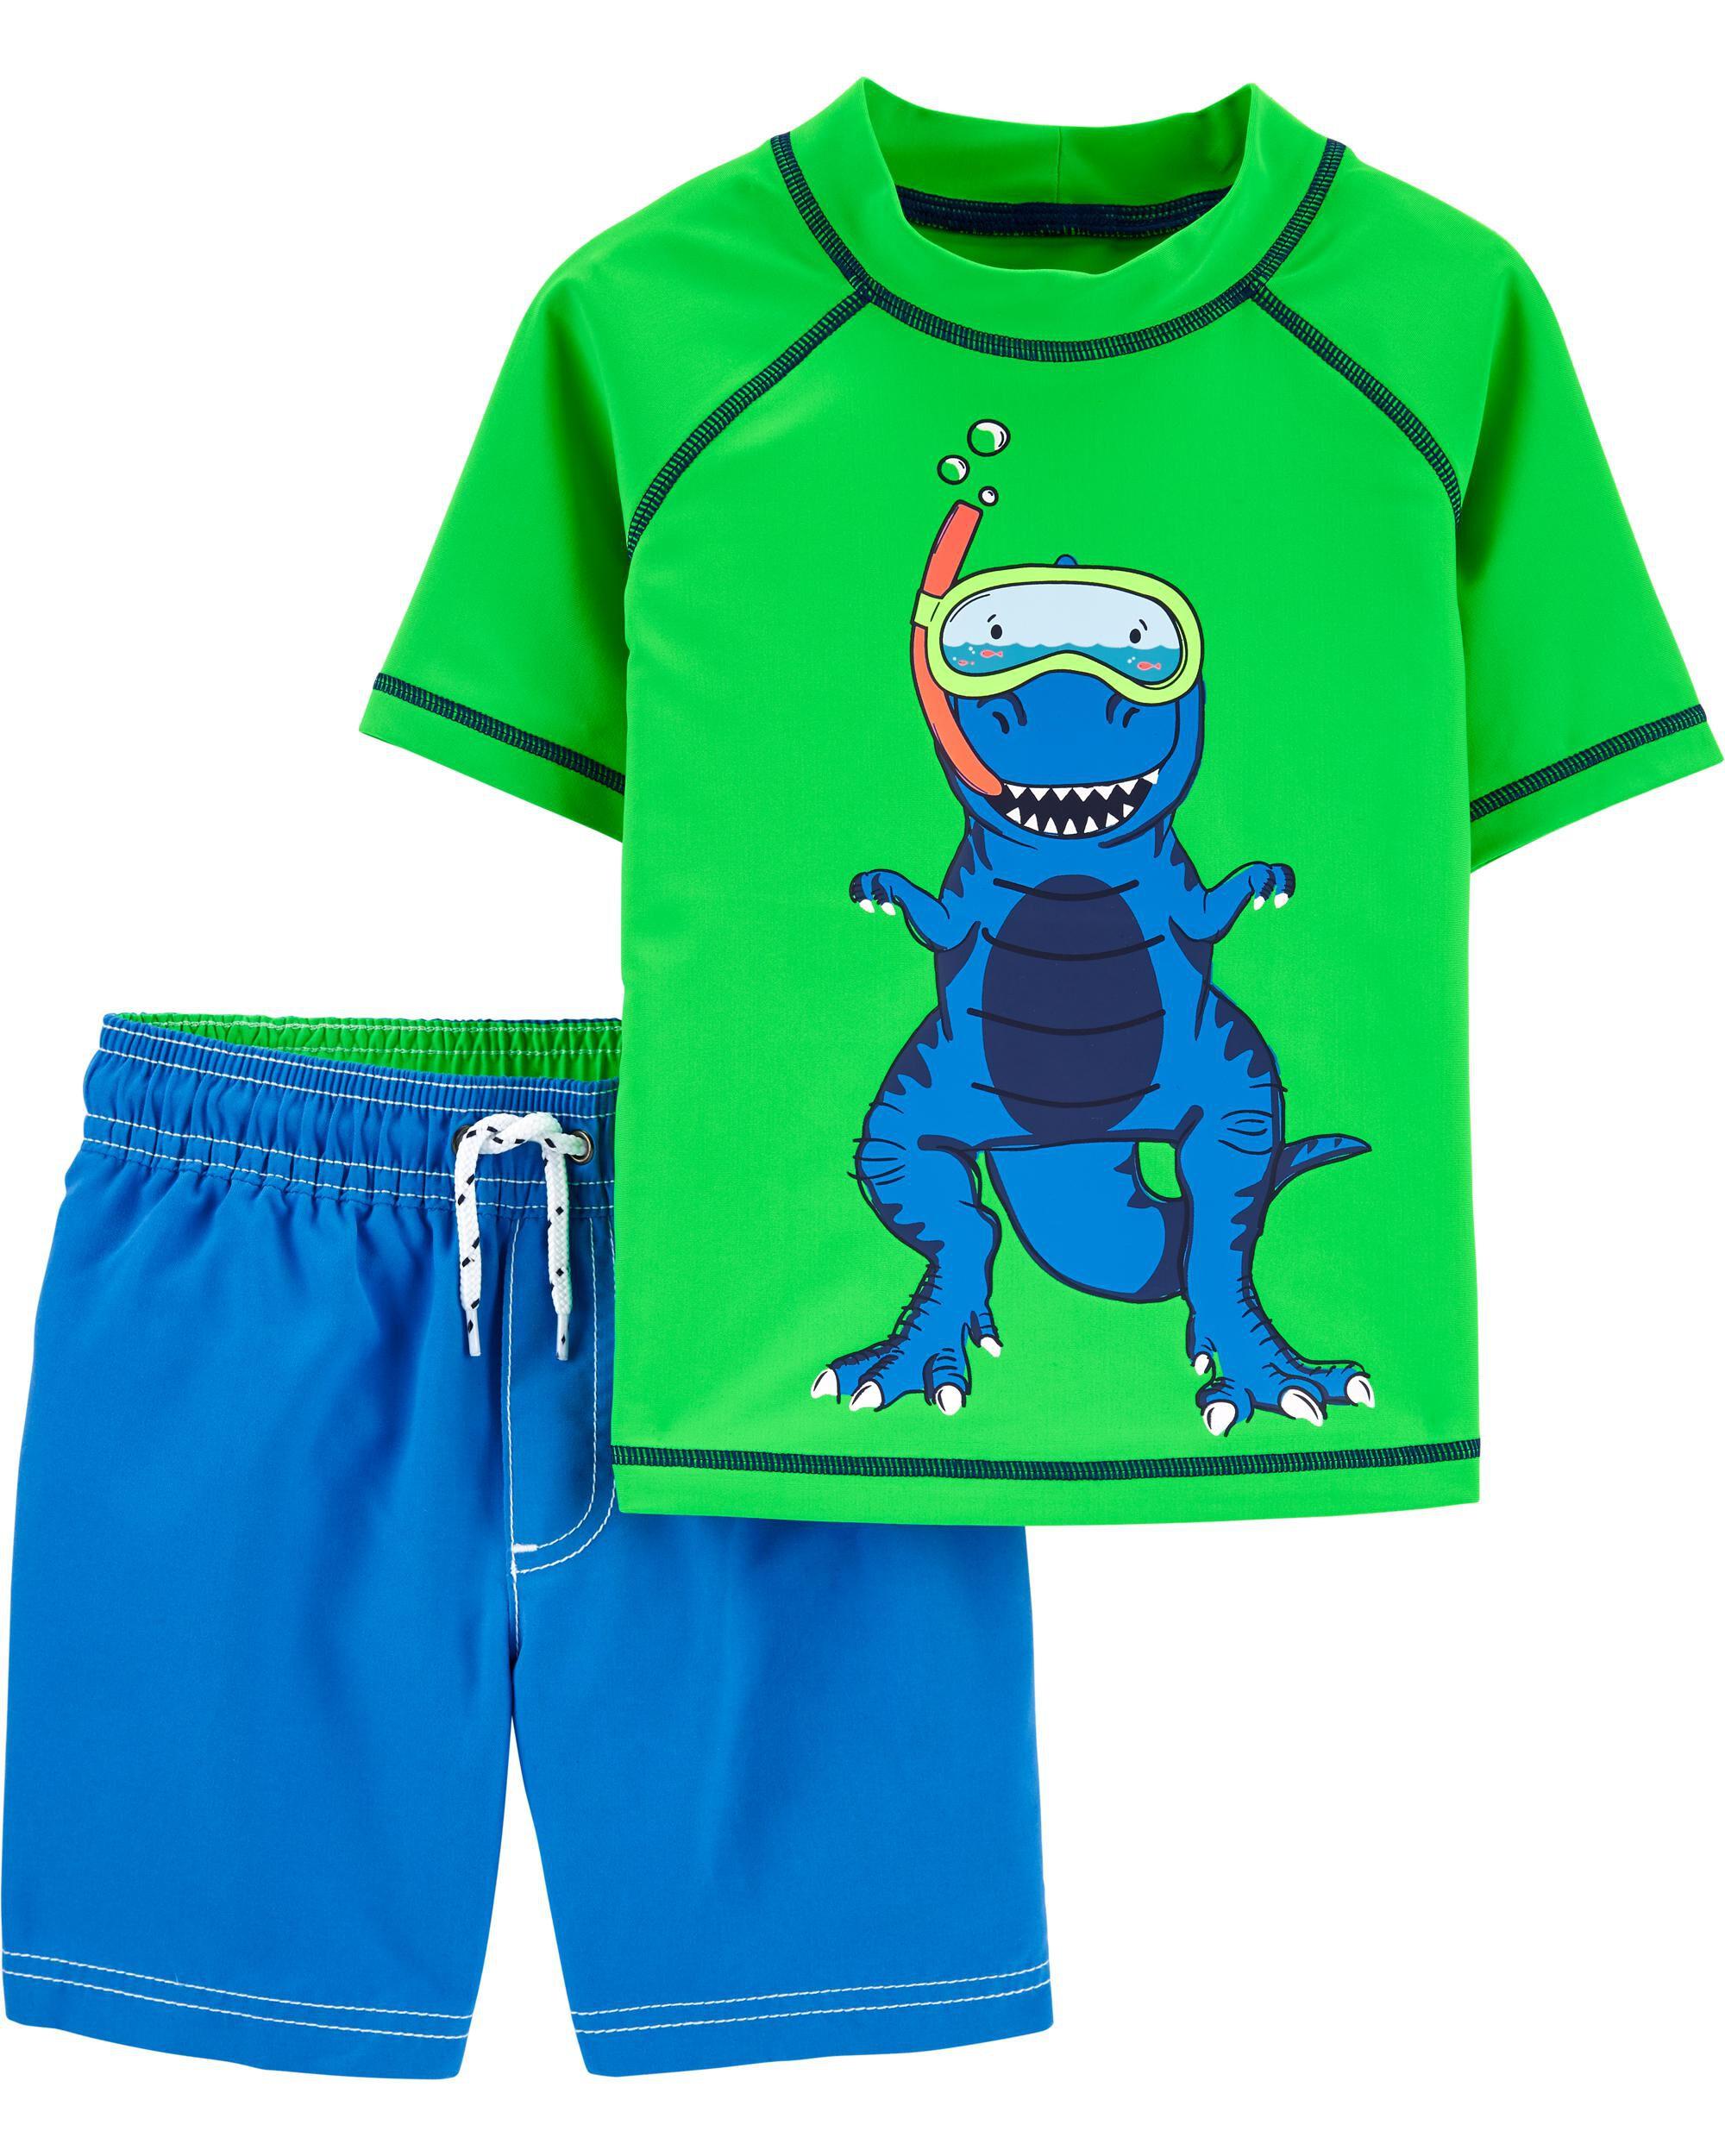 *CLEARANCE* Carter's Color Changing Dinosaur Rashguard Set